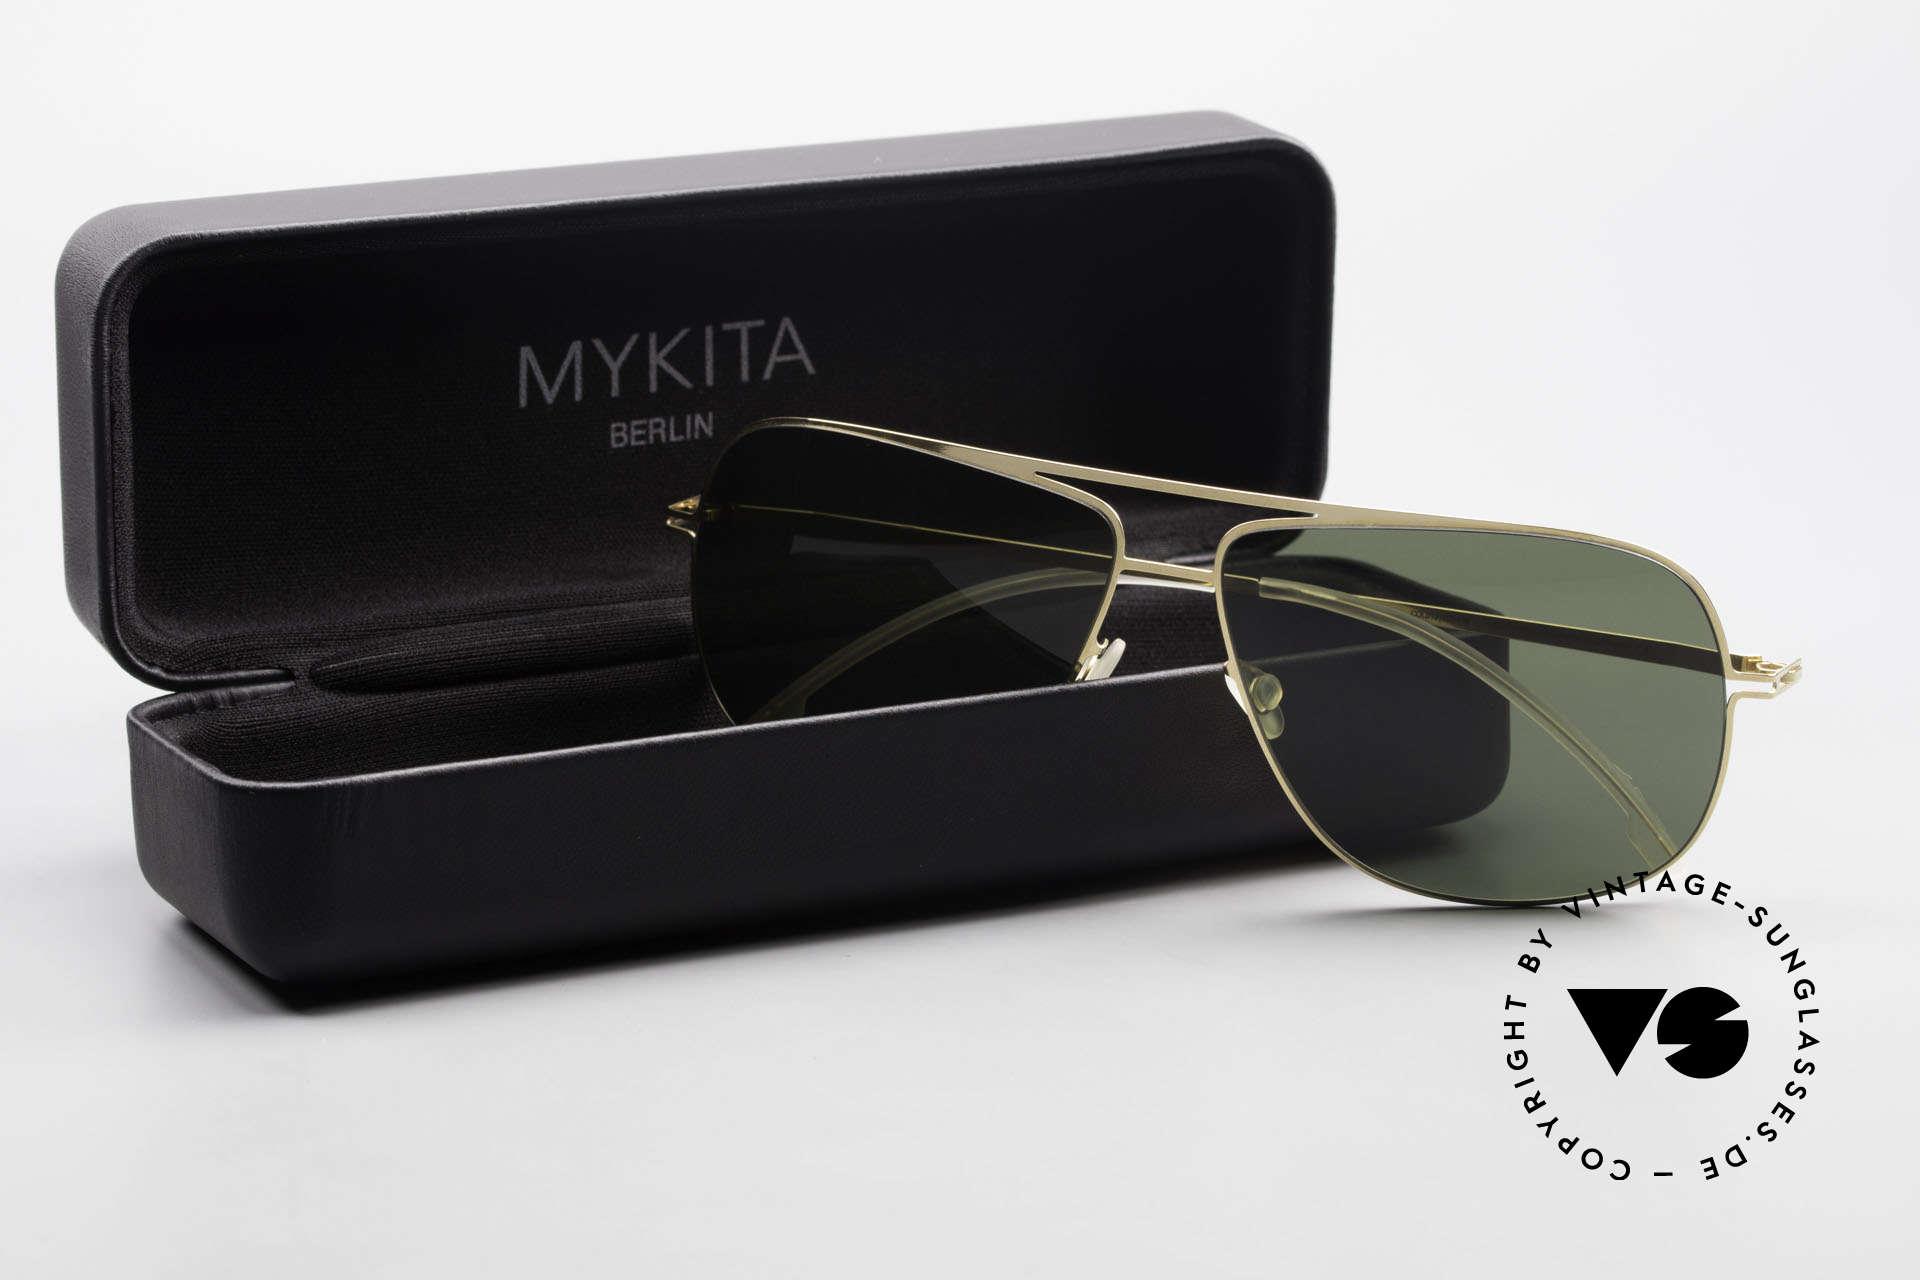 Mykita Jon Designer Lite Metal Sunglasses, Size: medium, Made for Men and Women